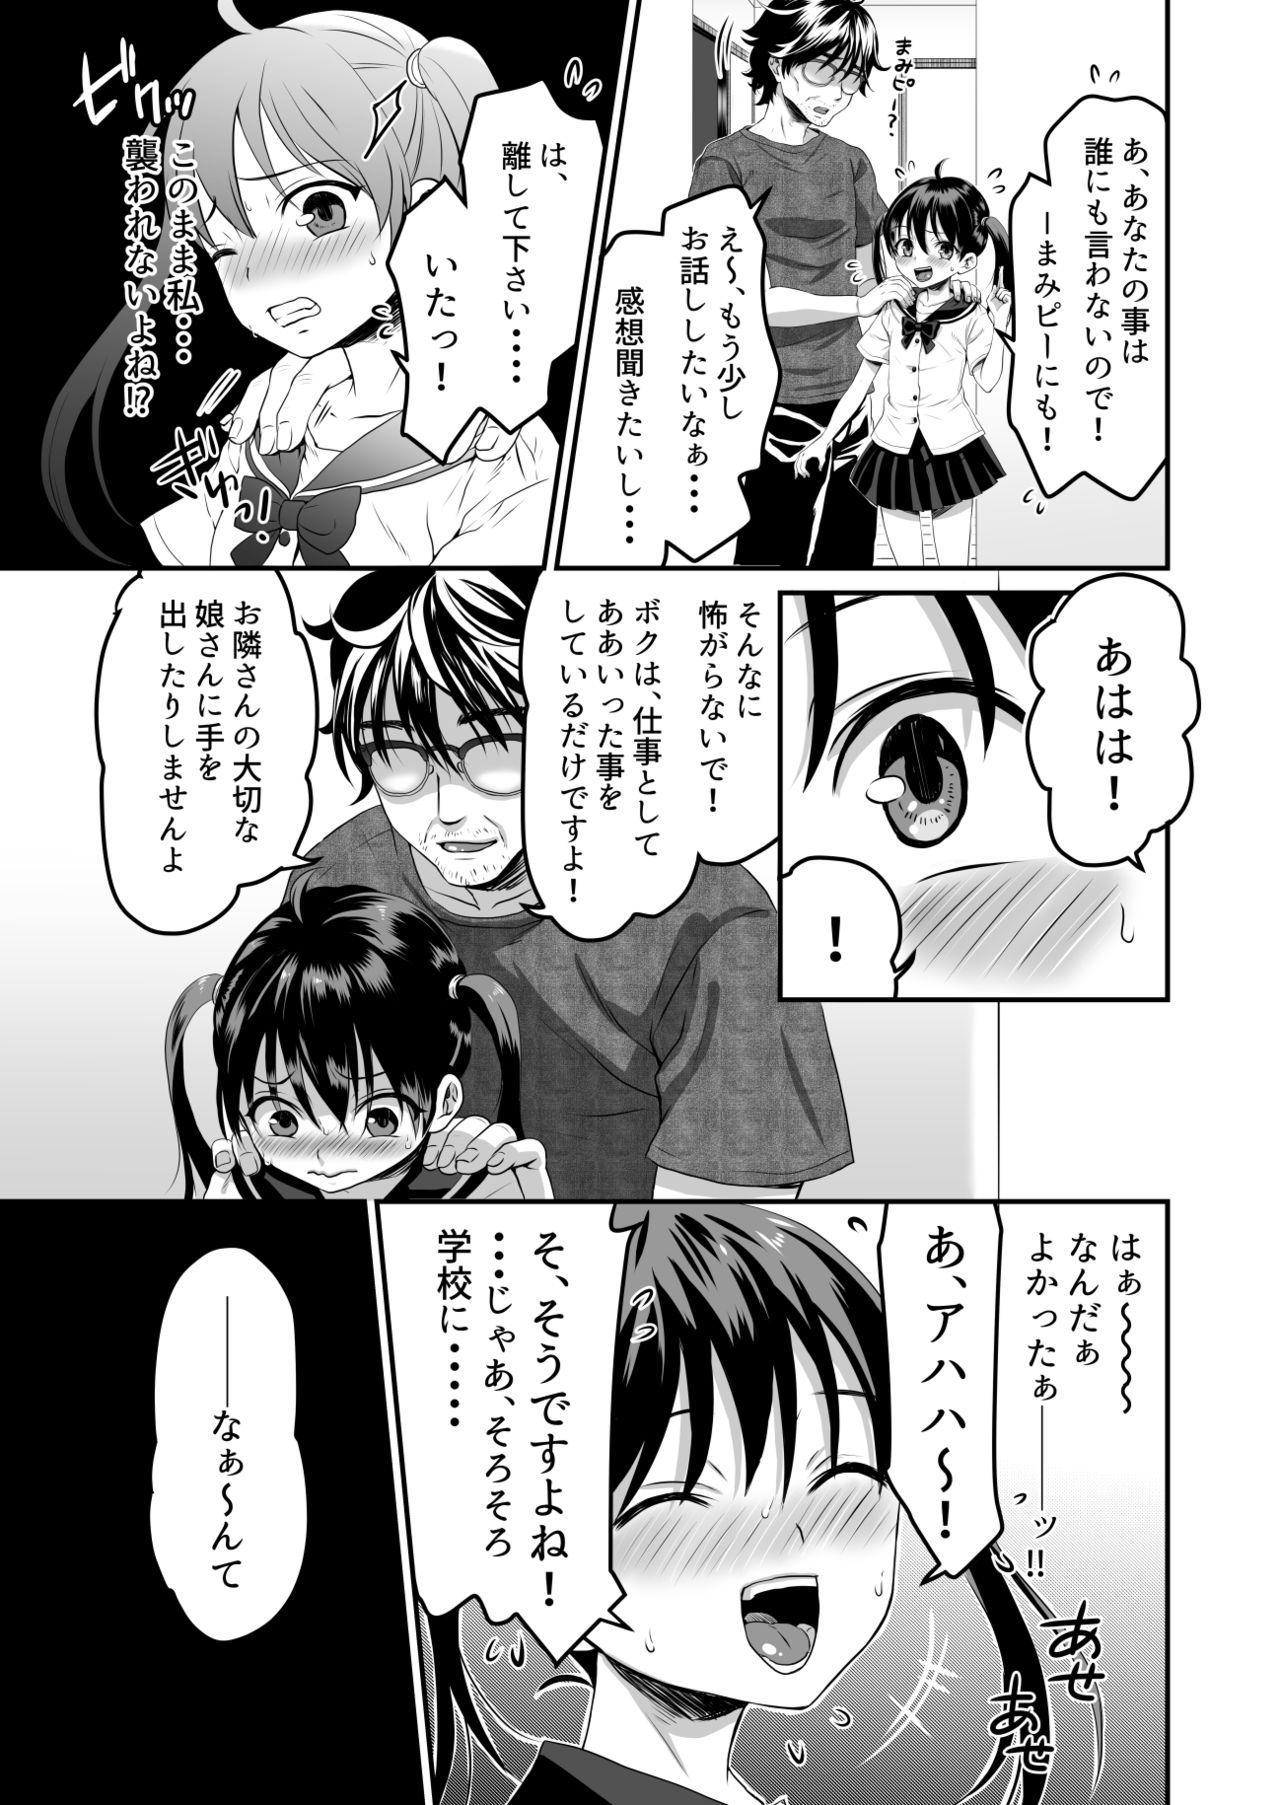 Otonari-san wa AV Danyuu 9